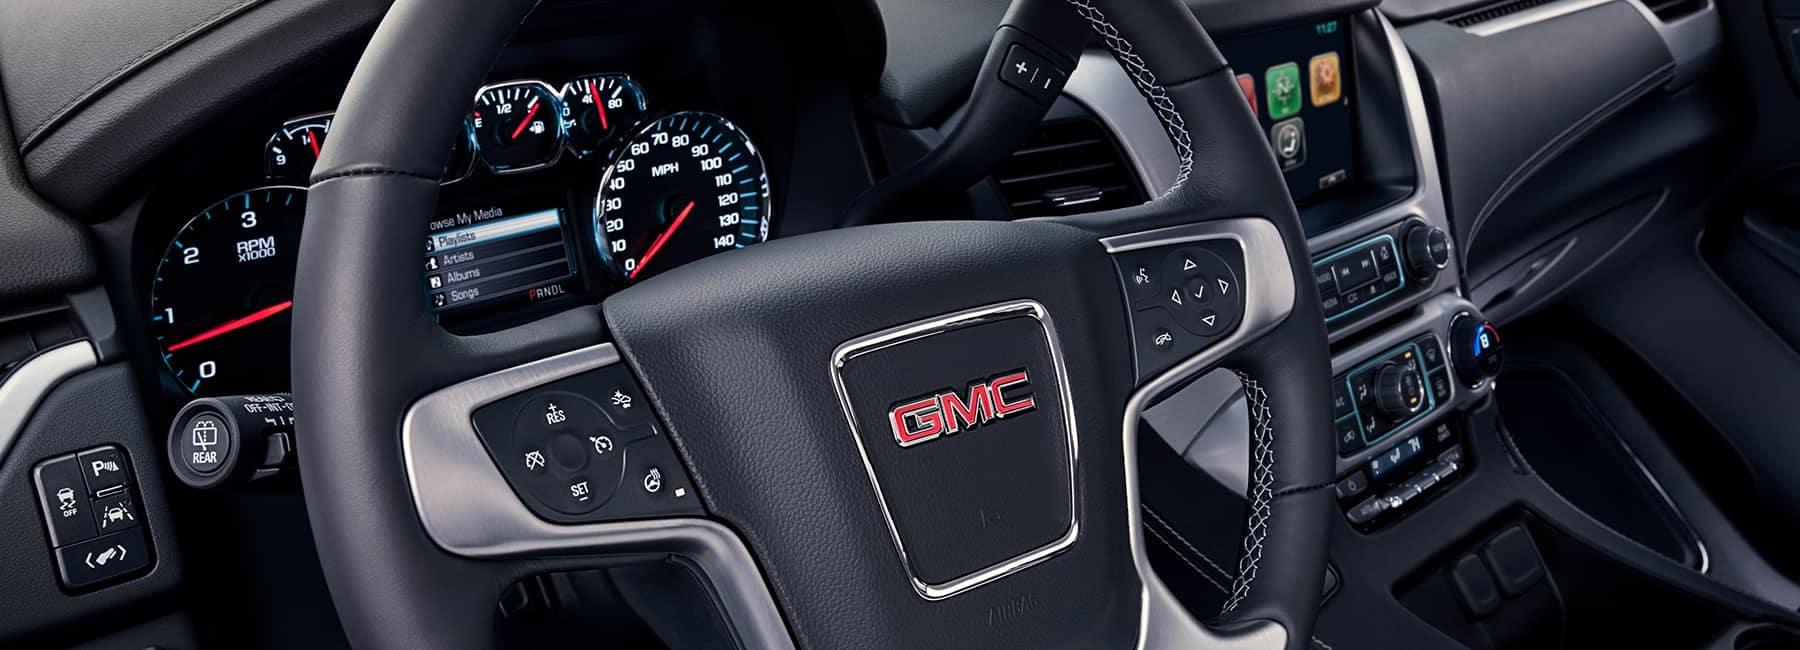 GMC Steering wheel